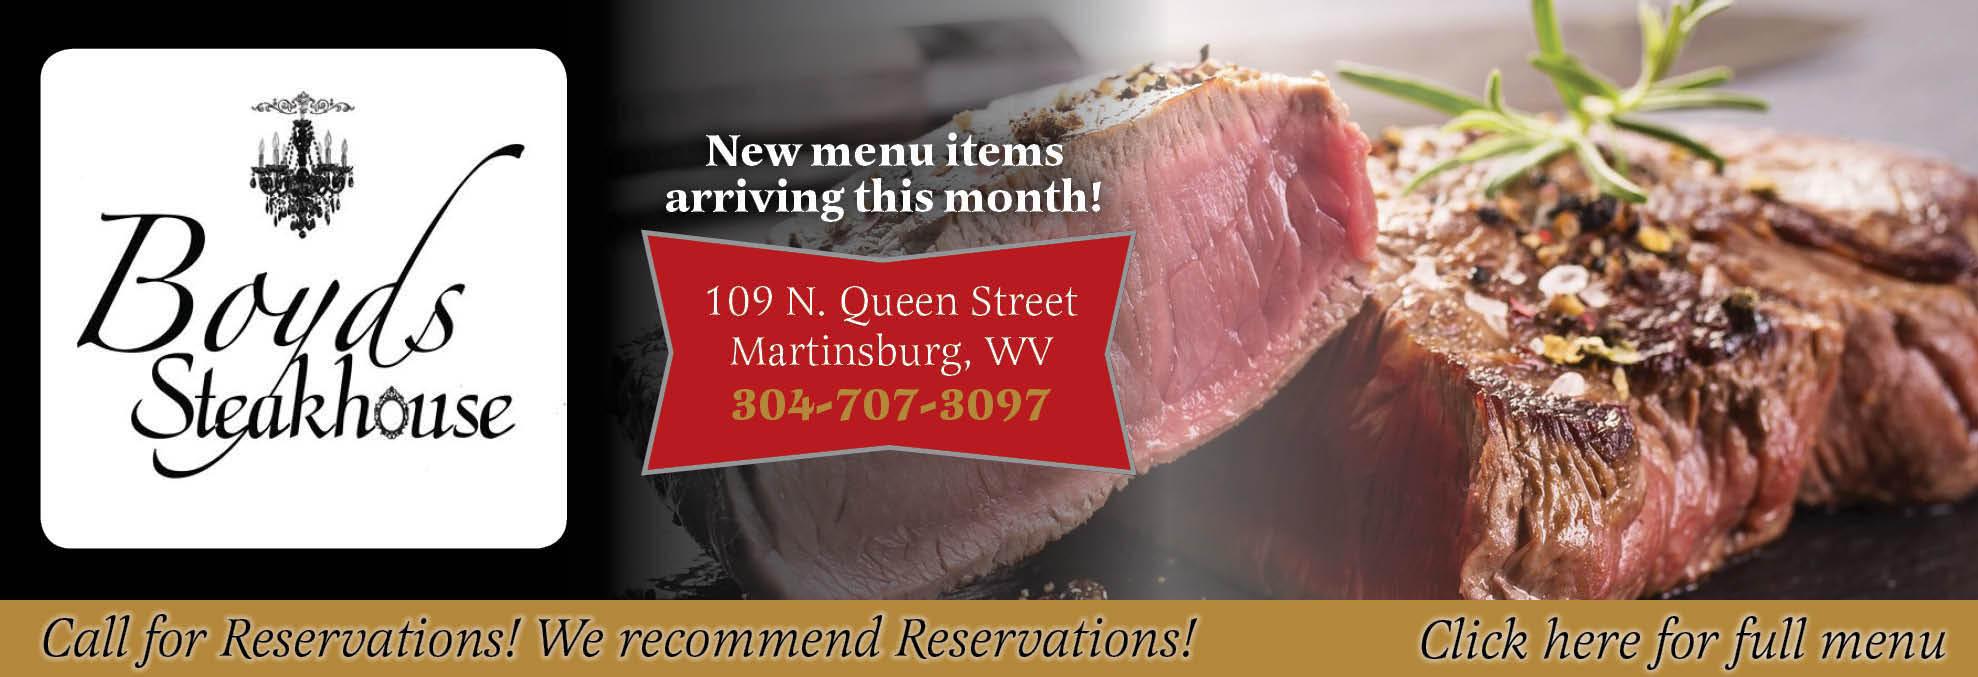 Boyd's Steakhouse, Lunch, Dinner, Brunch, Steak, Seafood,